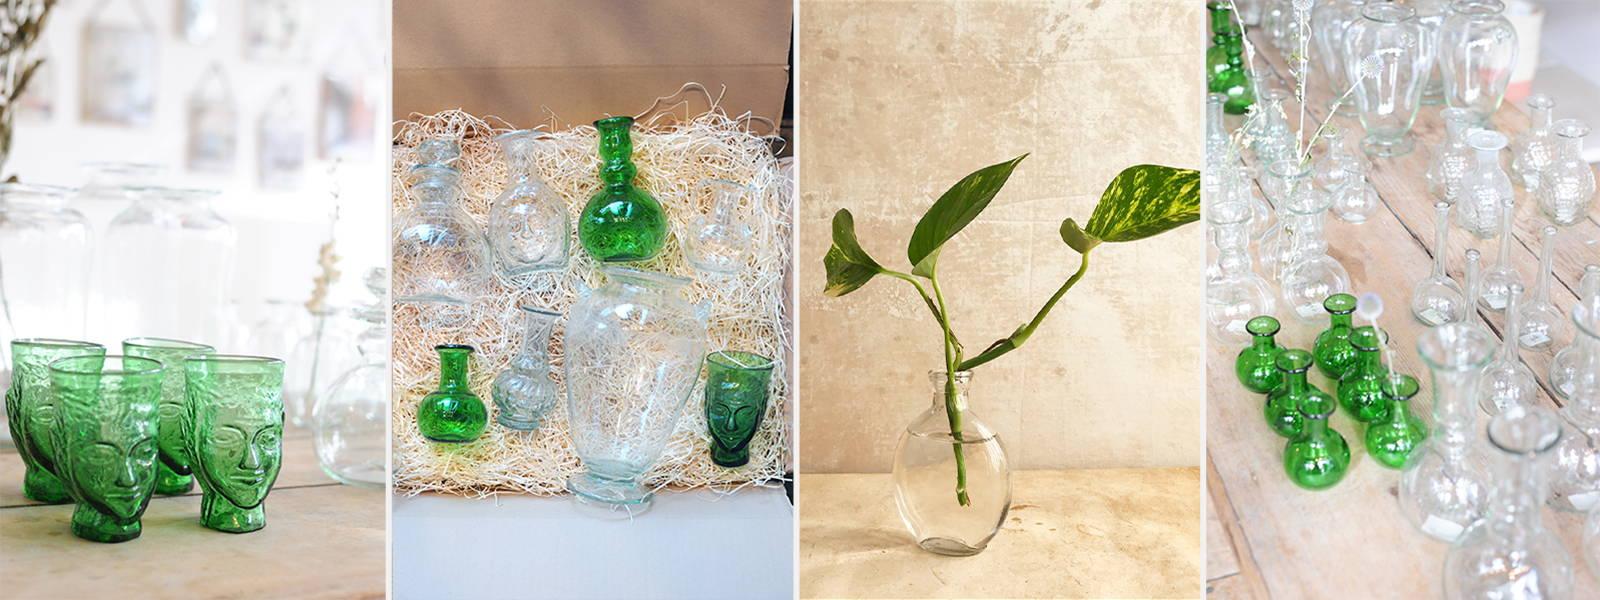 La Soufflerie Vases